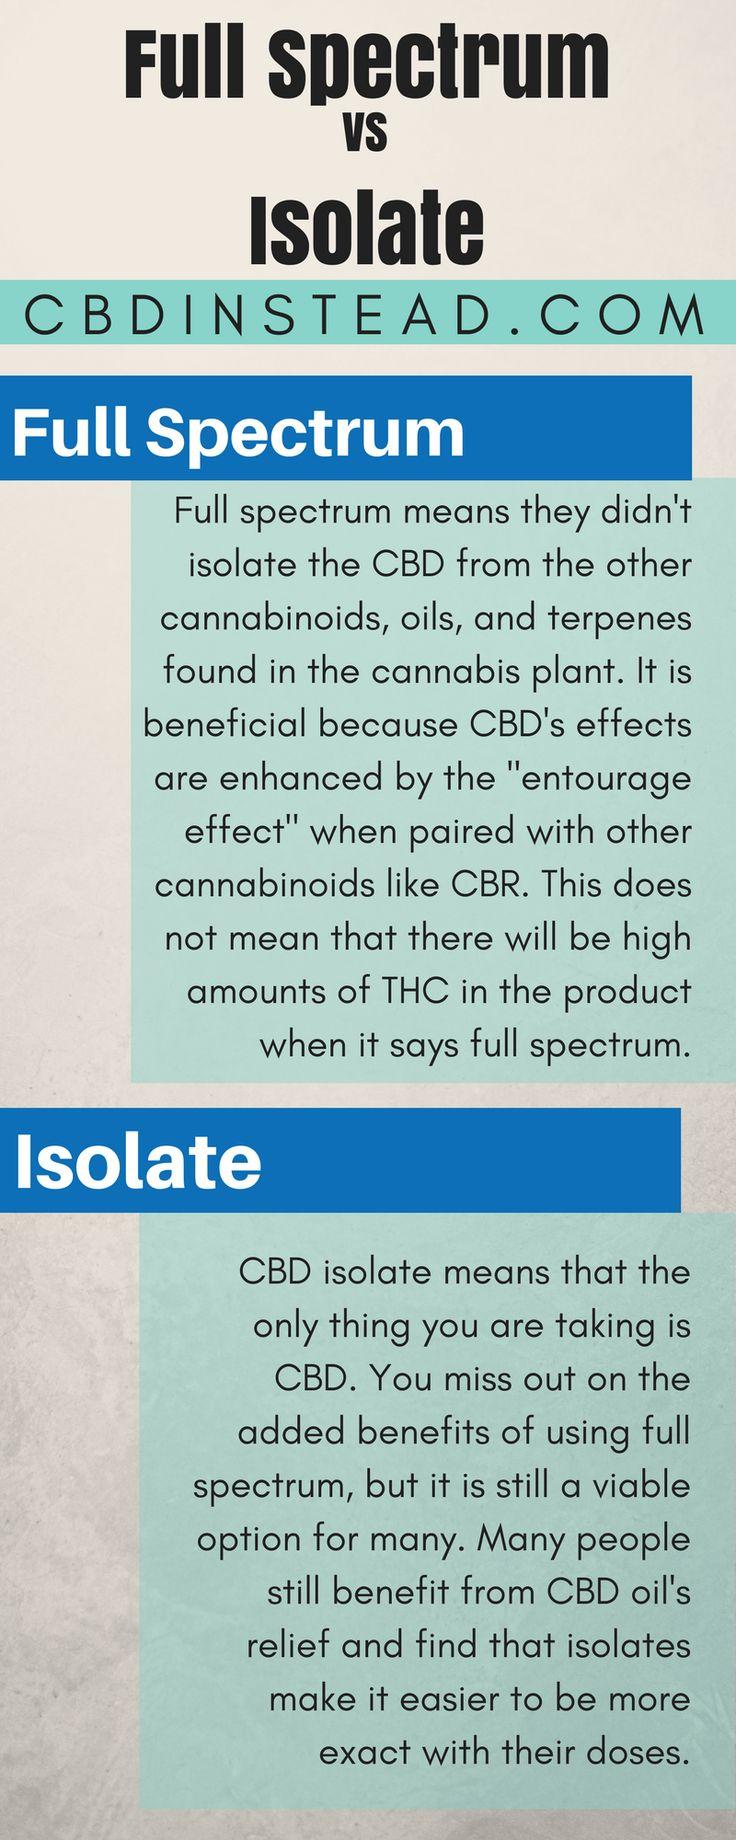 To get you CBD isolate or full spectrum hemp oil, visit us today! #CBD #Hemp #marijuana @crowdfire